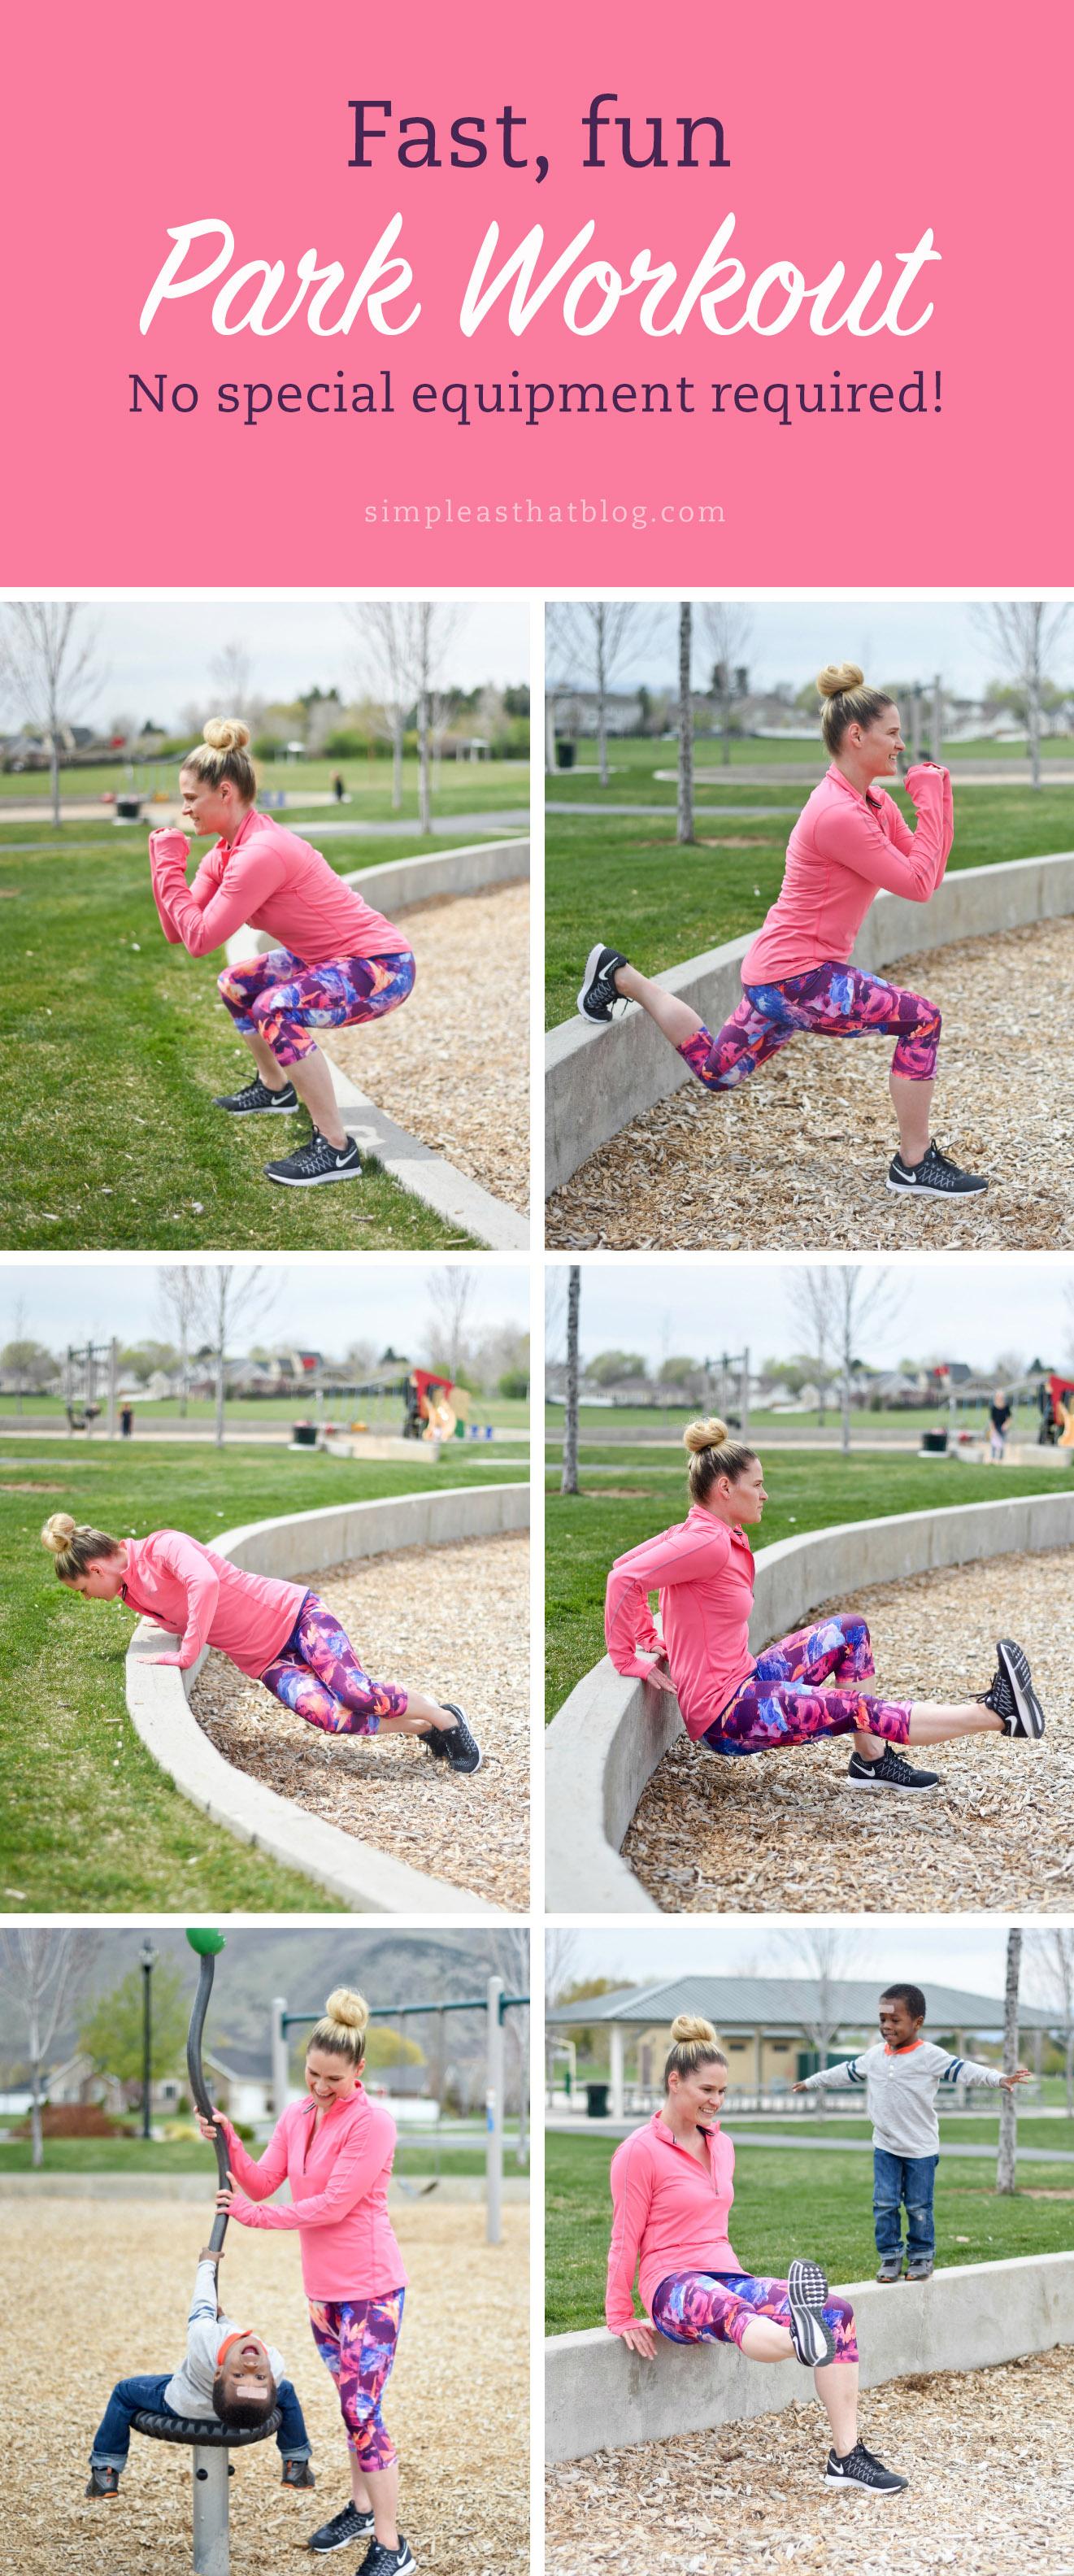 Exercises self amusement P